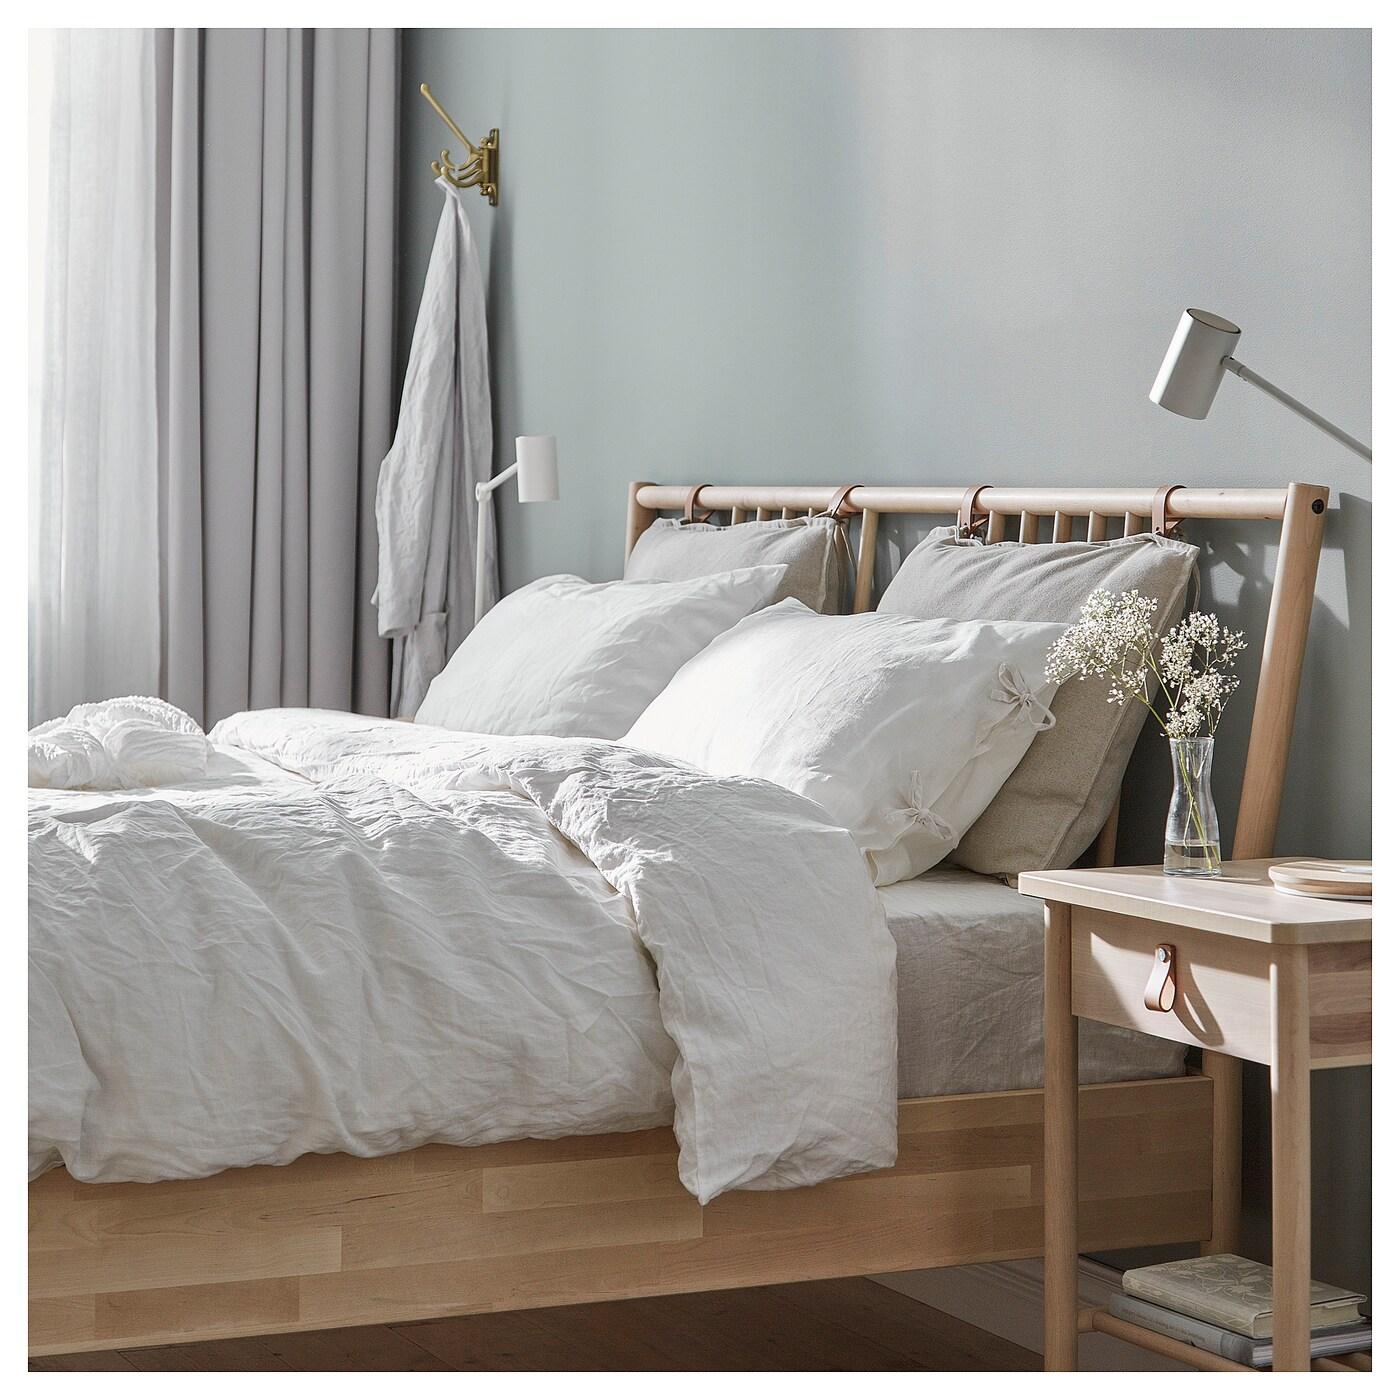 Bj rksn s bed frame birch lur y standard king ikea - Base a doghe ikea ...